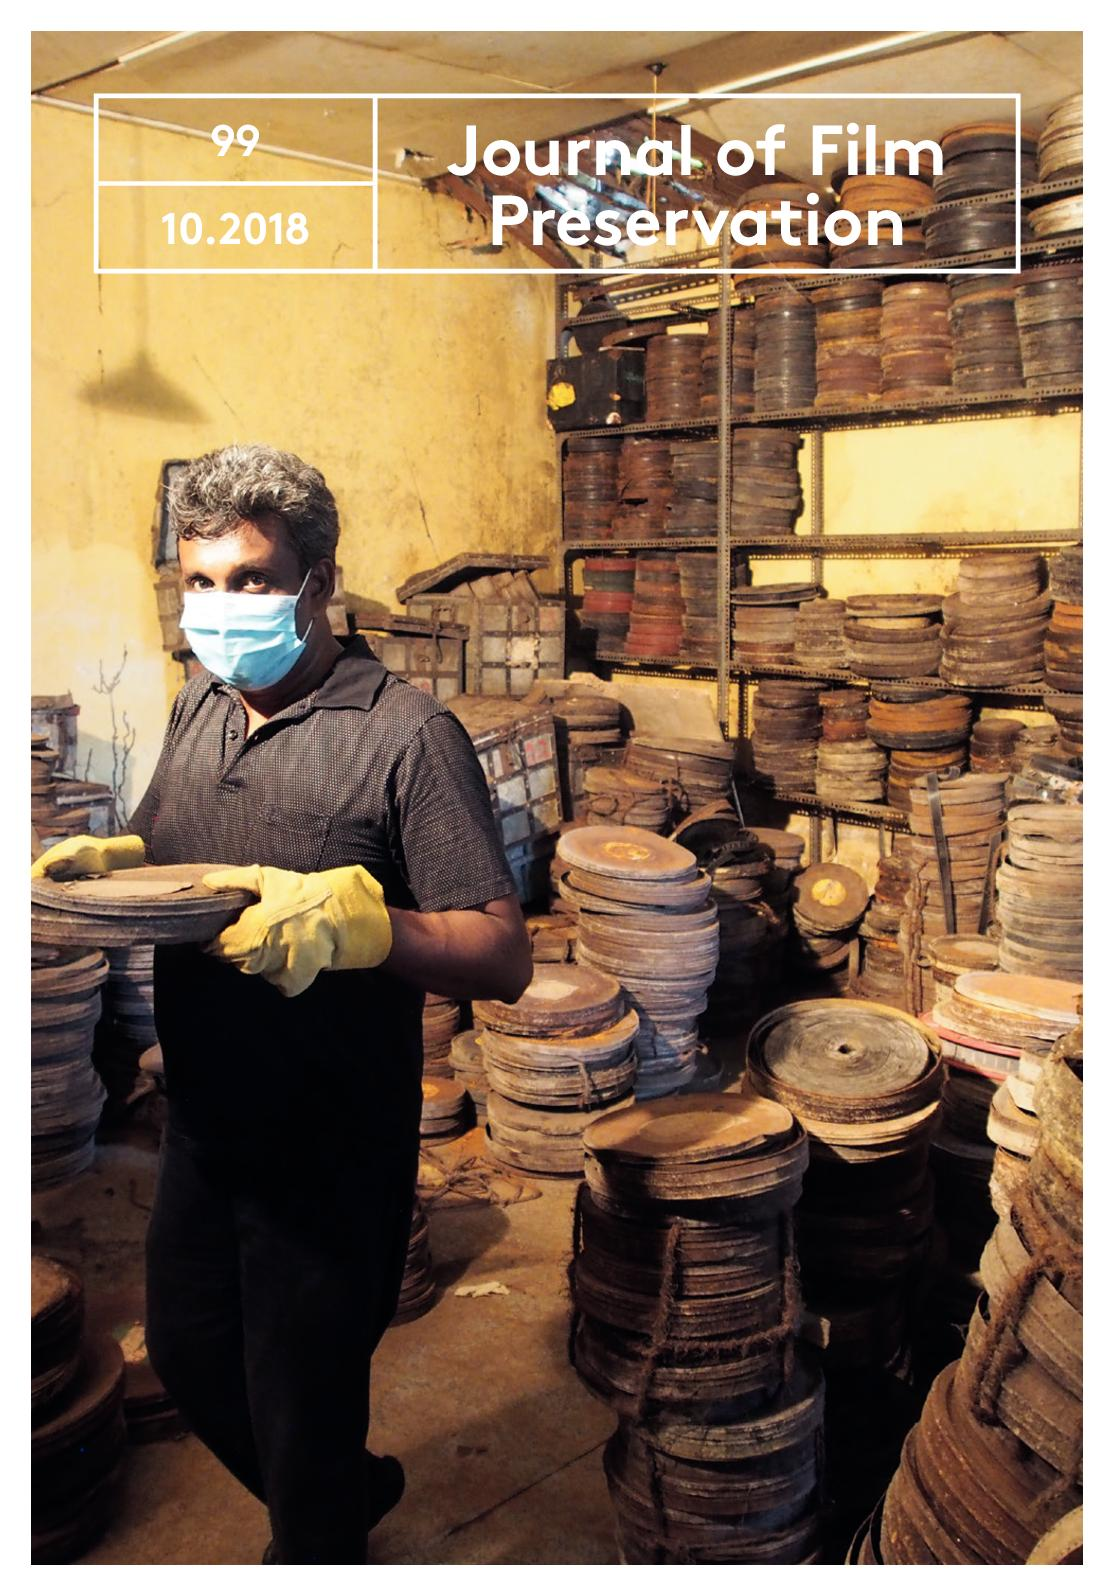 Calameo Journal Of Film Preservation 99 October 2018